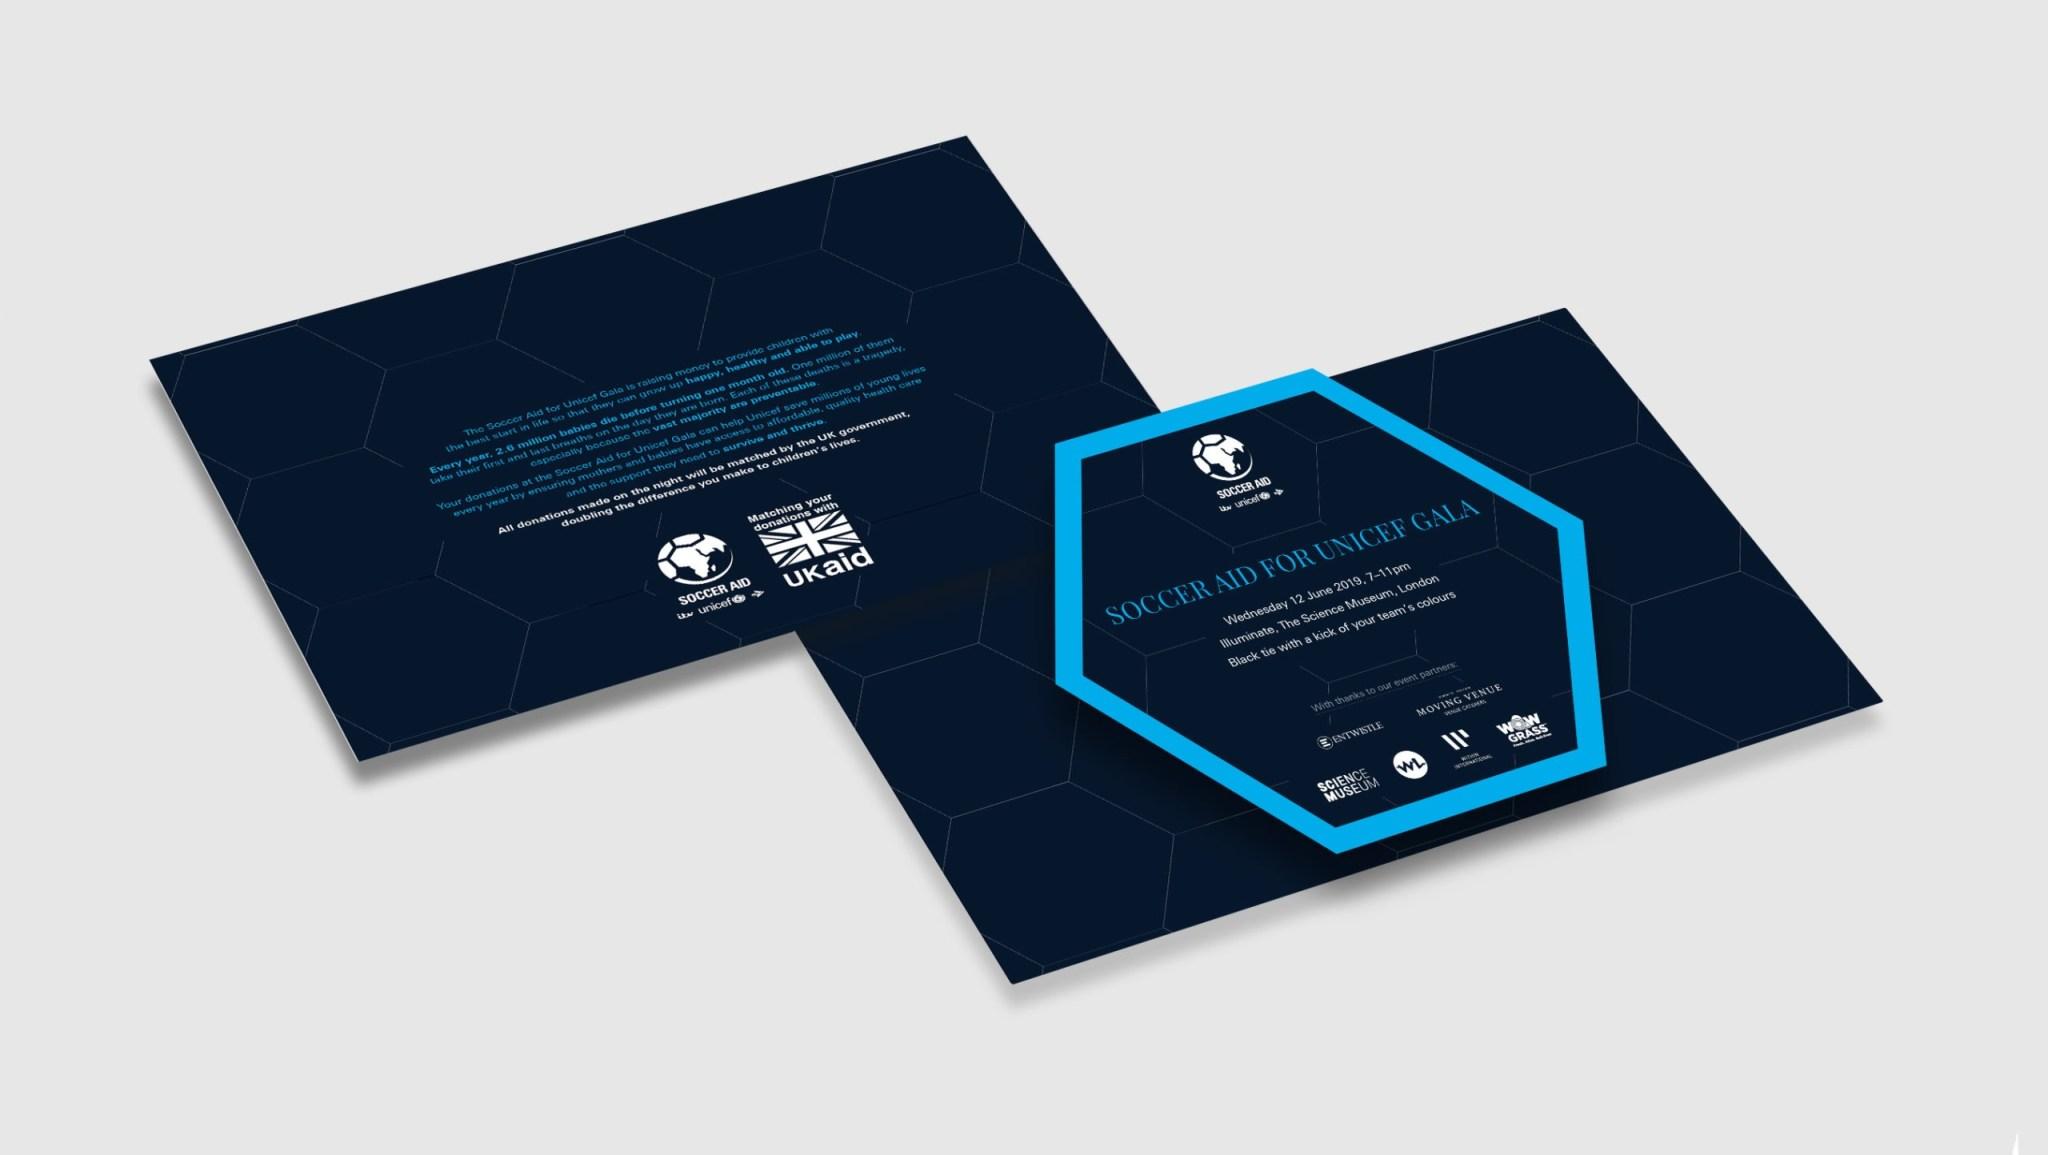 Unicef Soccer Aid gala invitation